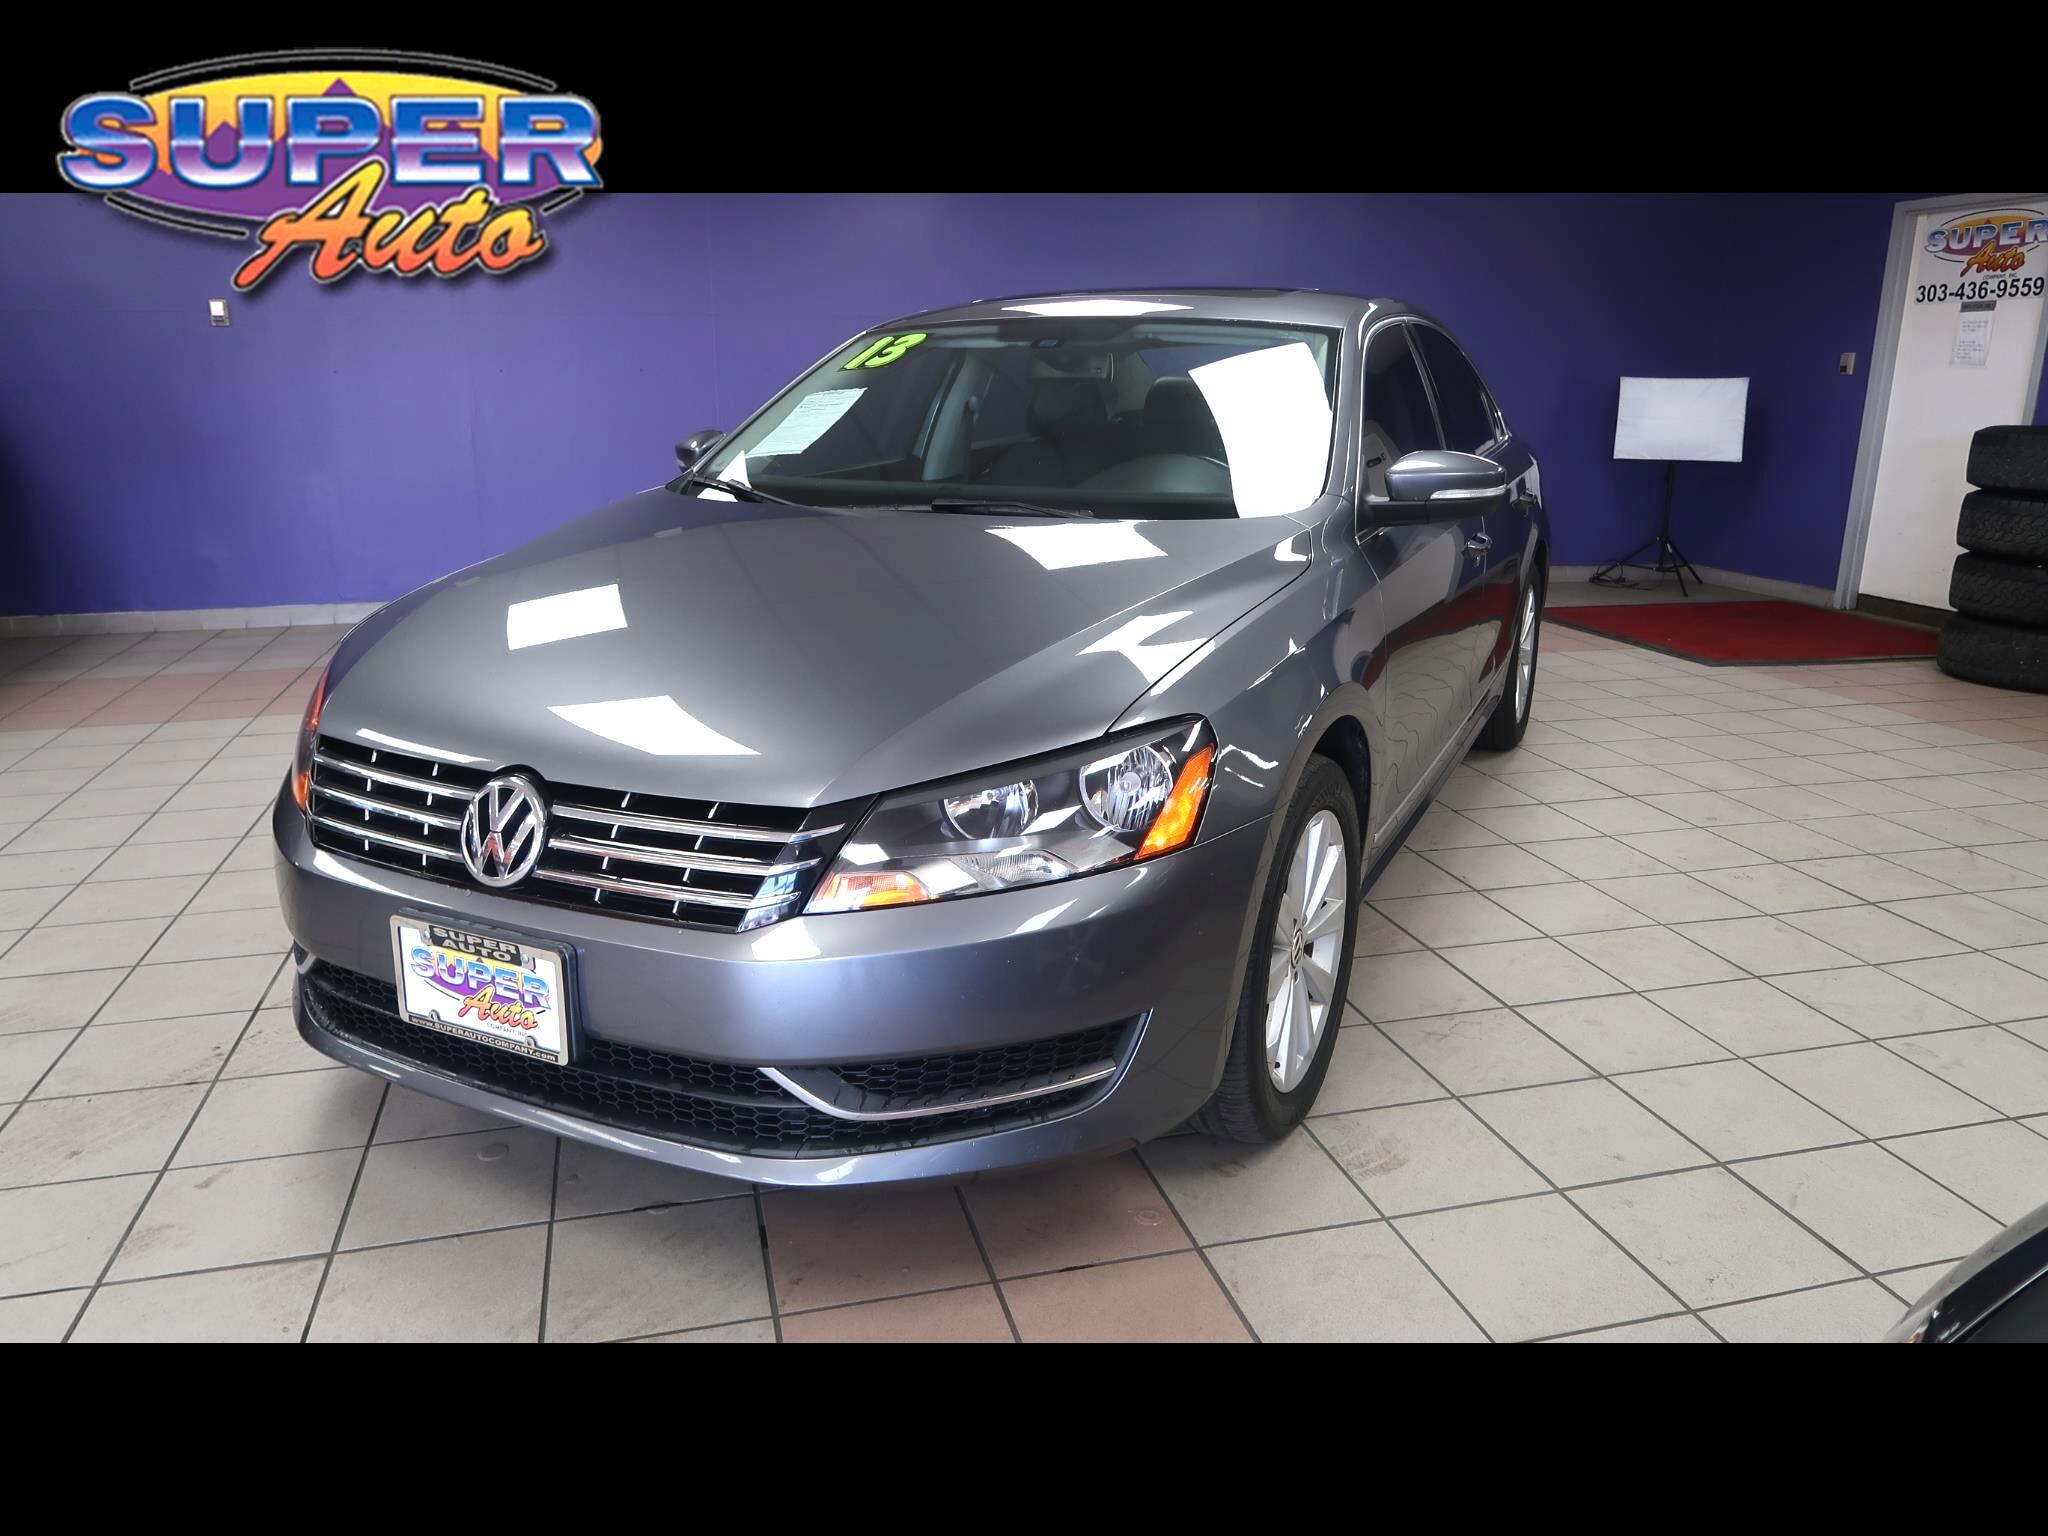 2013 Volkswagen Passat 4dr Sdn 2.5L Auto SEL *Ltd Avail*